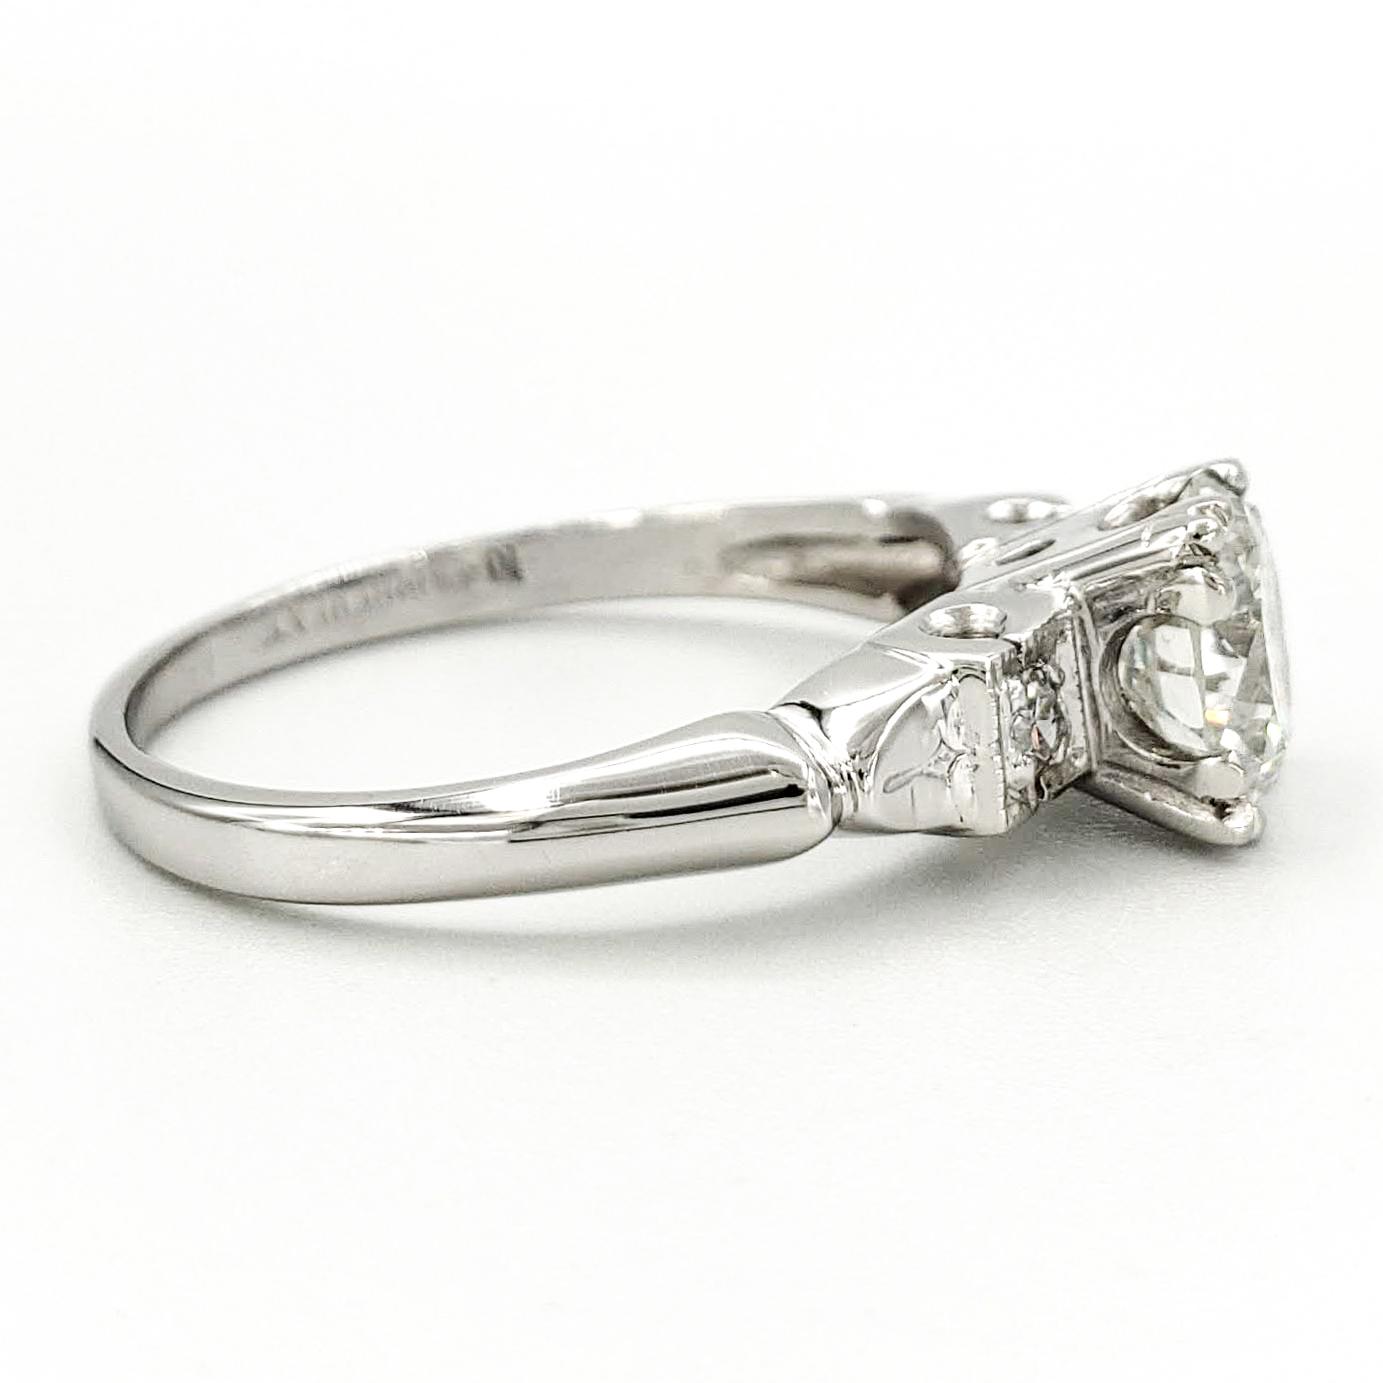 vintage-platinum-engagement-ring-with-1-15-carat-round-brilliant-cut-diamond-egl-g-vs2